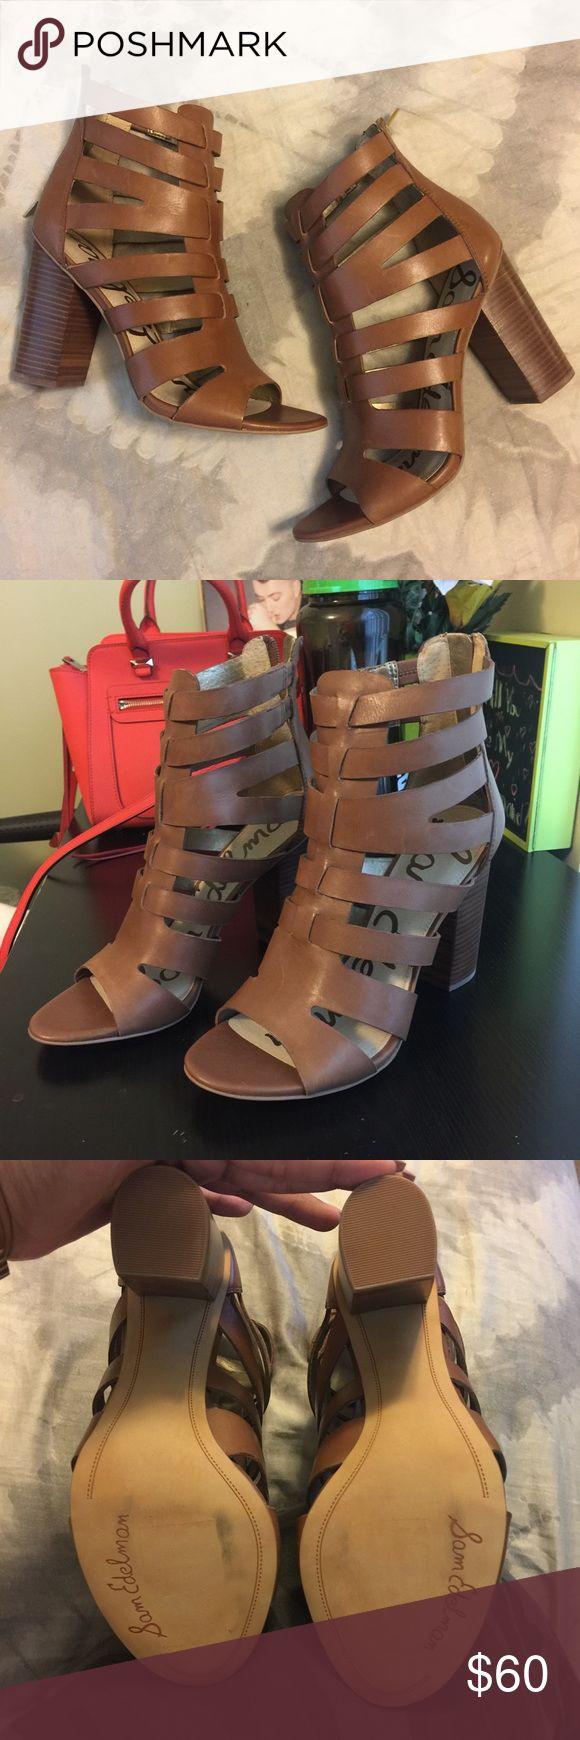 Sam Edelman Heels Sam Edelman caged heels. Size 9.5. Zipper back. Never worn Sam Edelman Shoes Heels